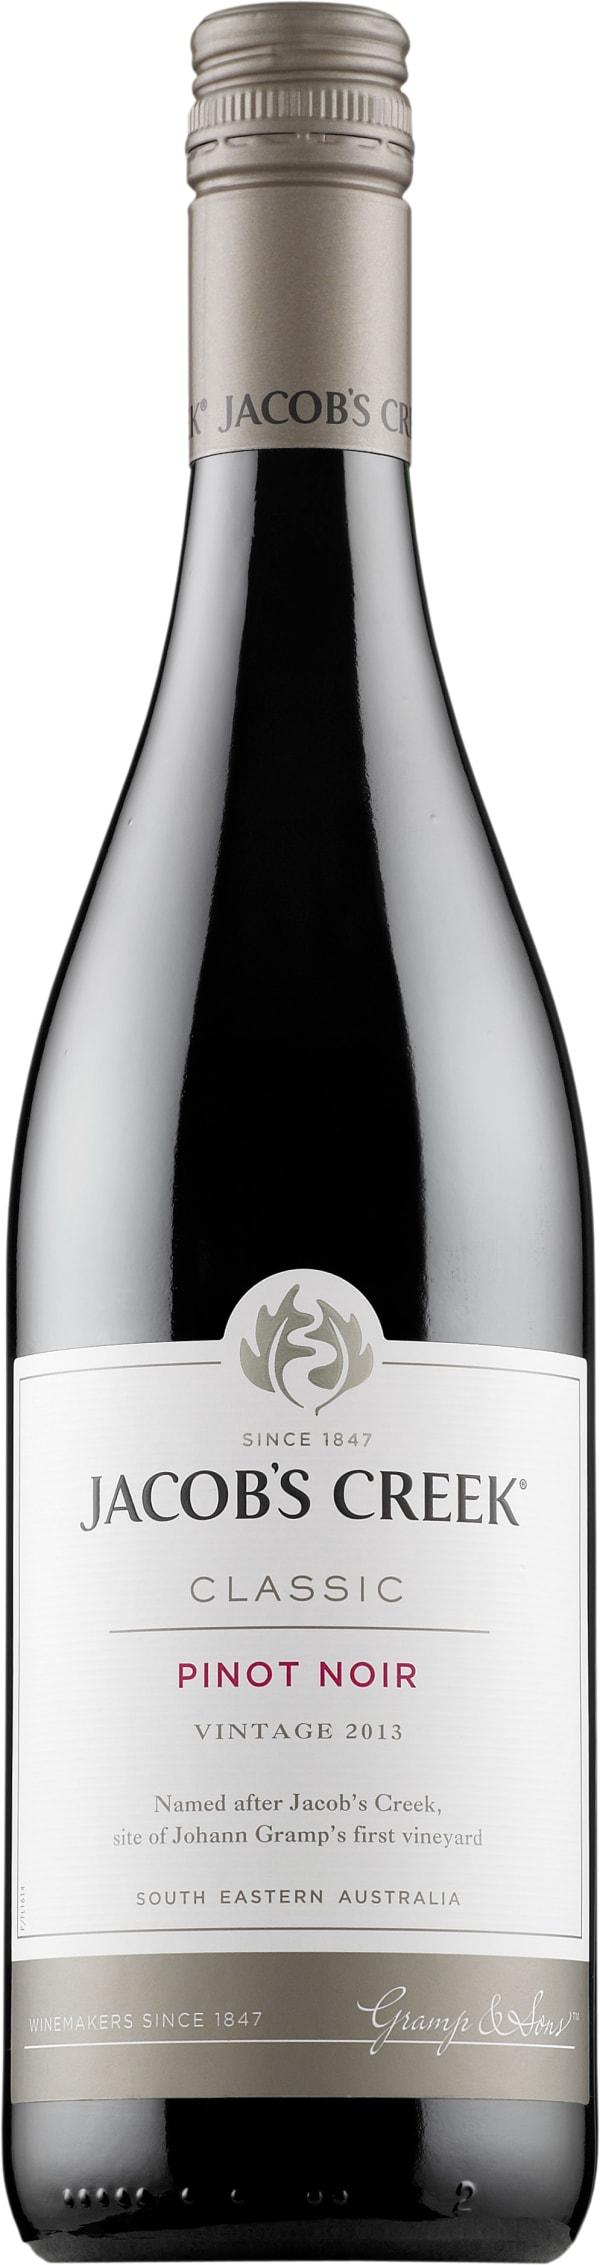 Jacob's Creek Pinot Noir 2020